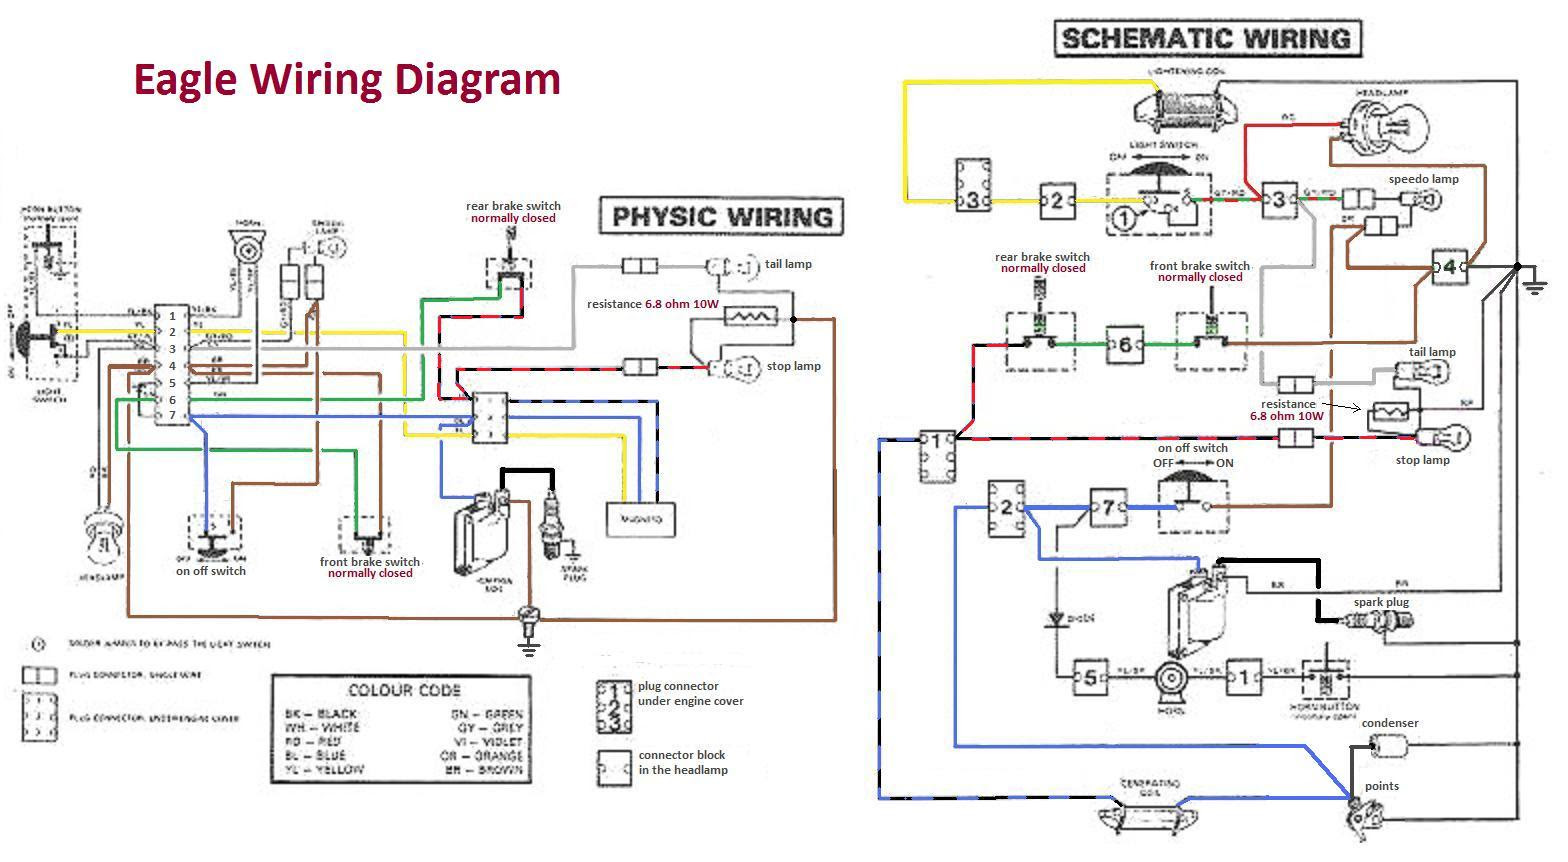 Diagram Cushman Eagle Wiring Diagram Full Version Hd Quality Wiring Diagram Diagramsluis Radioueb It